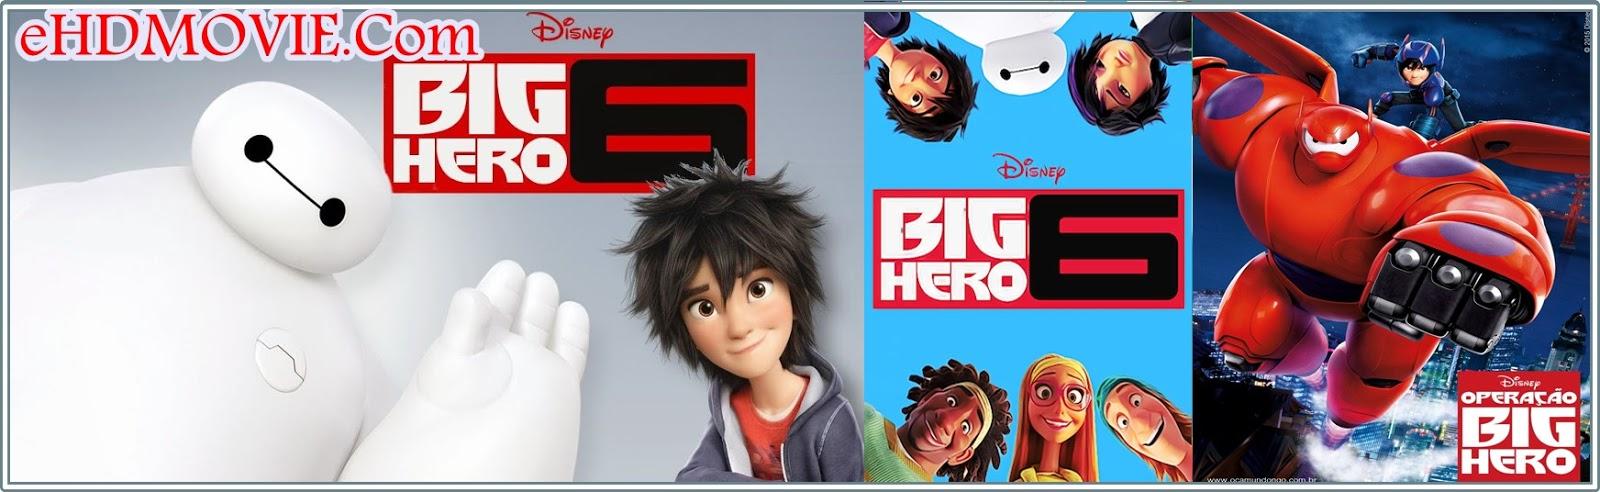 Big Hero 6 2014 Full Movie Dual Audio [Hindi – English] 720p - 480p ORG BRRip 350MB - 850MB ESubs Free Download